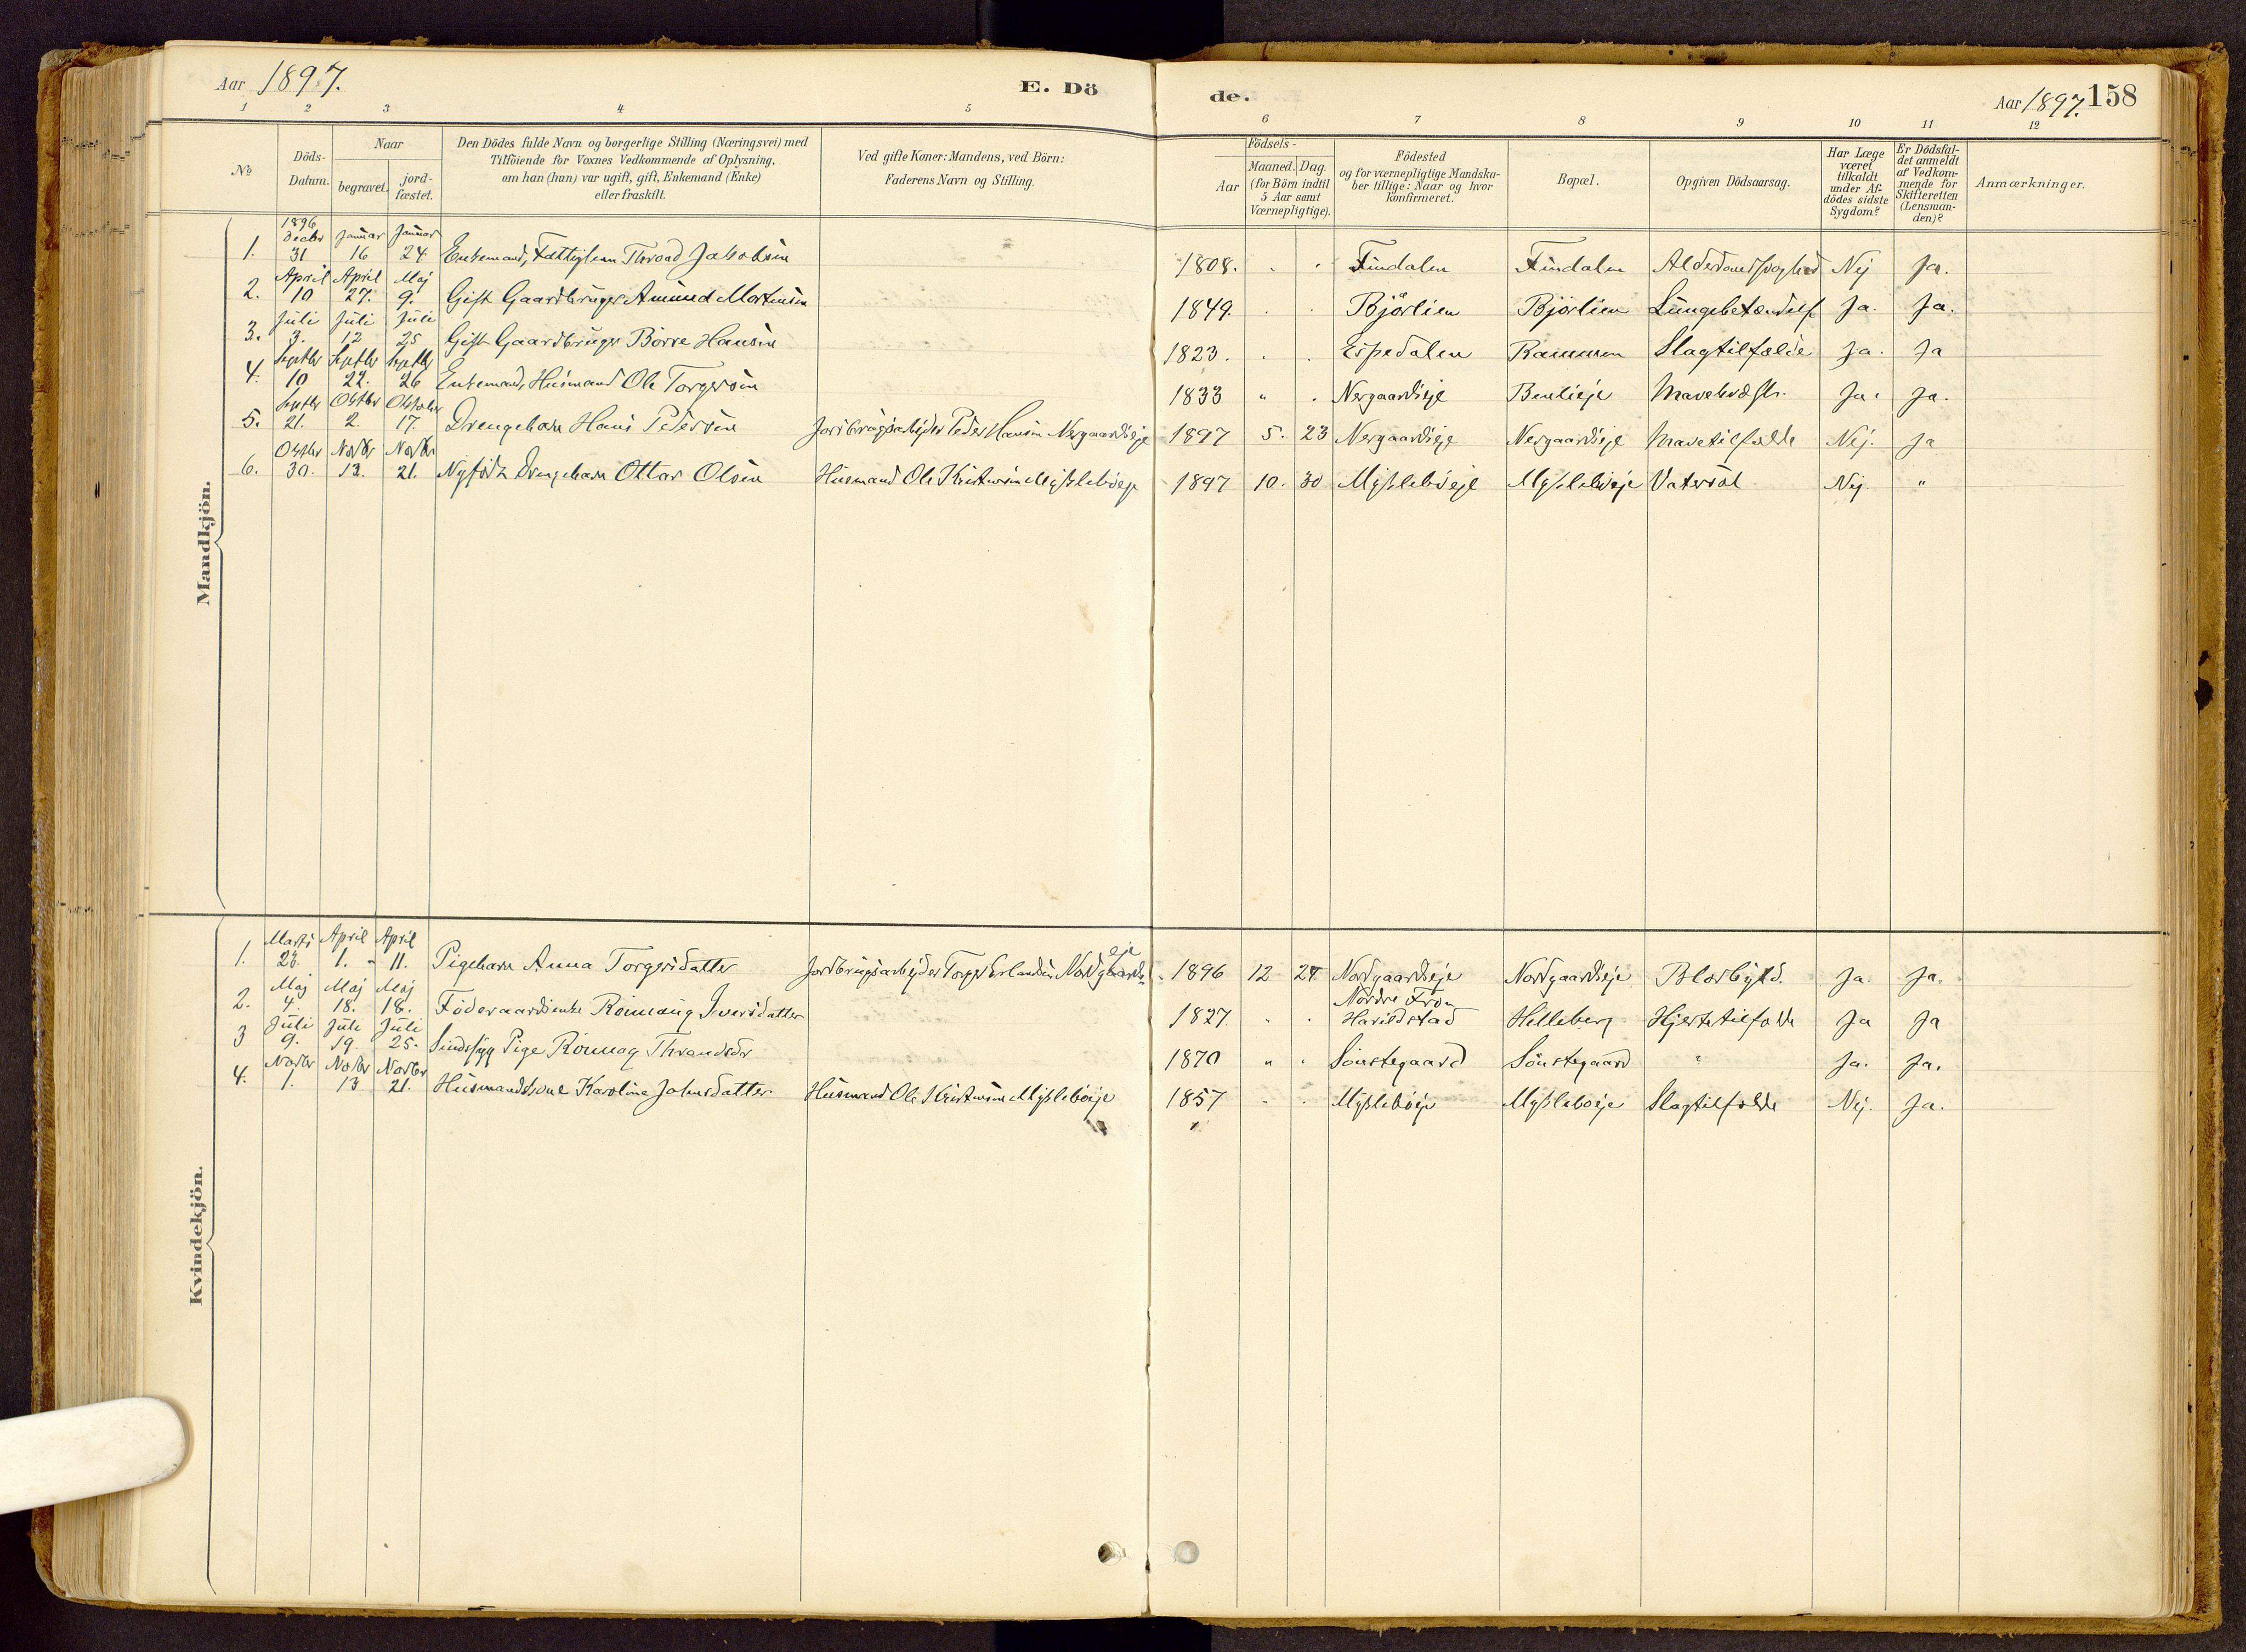 SAH, Vestre Gausdal prestekontor, Ministerialbok nr. 2, 1887-1918, s. 158